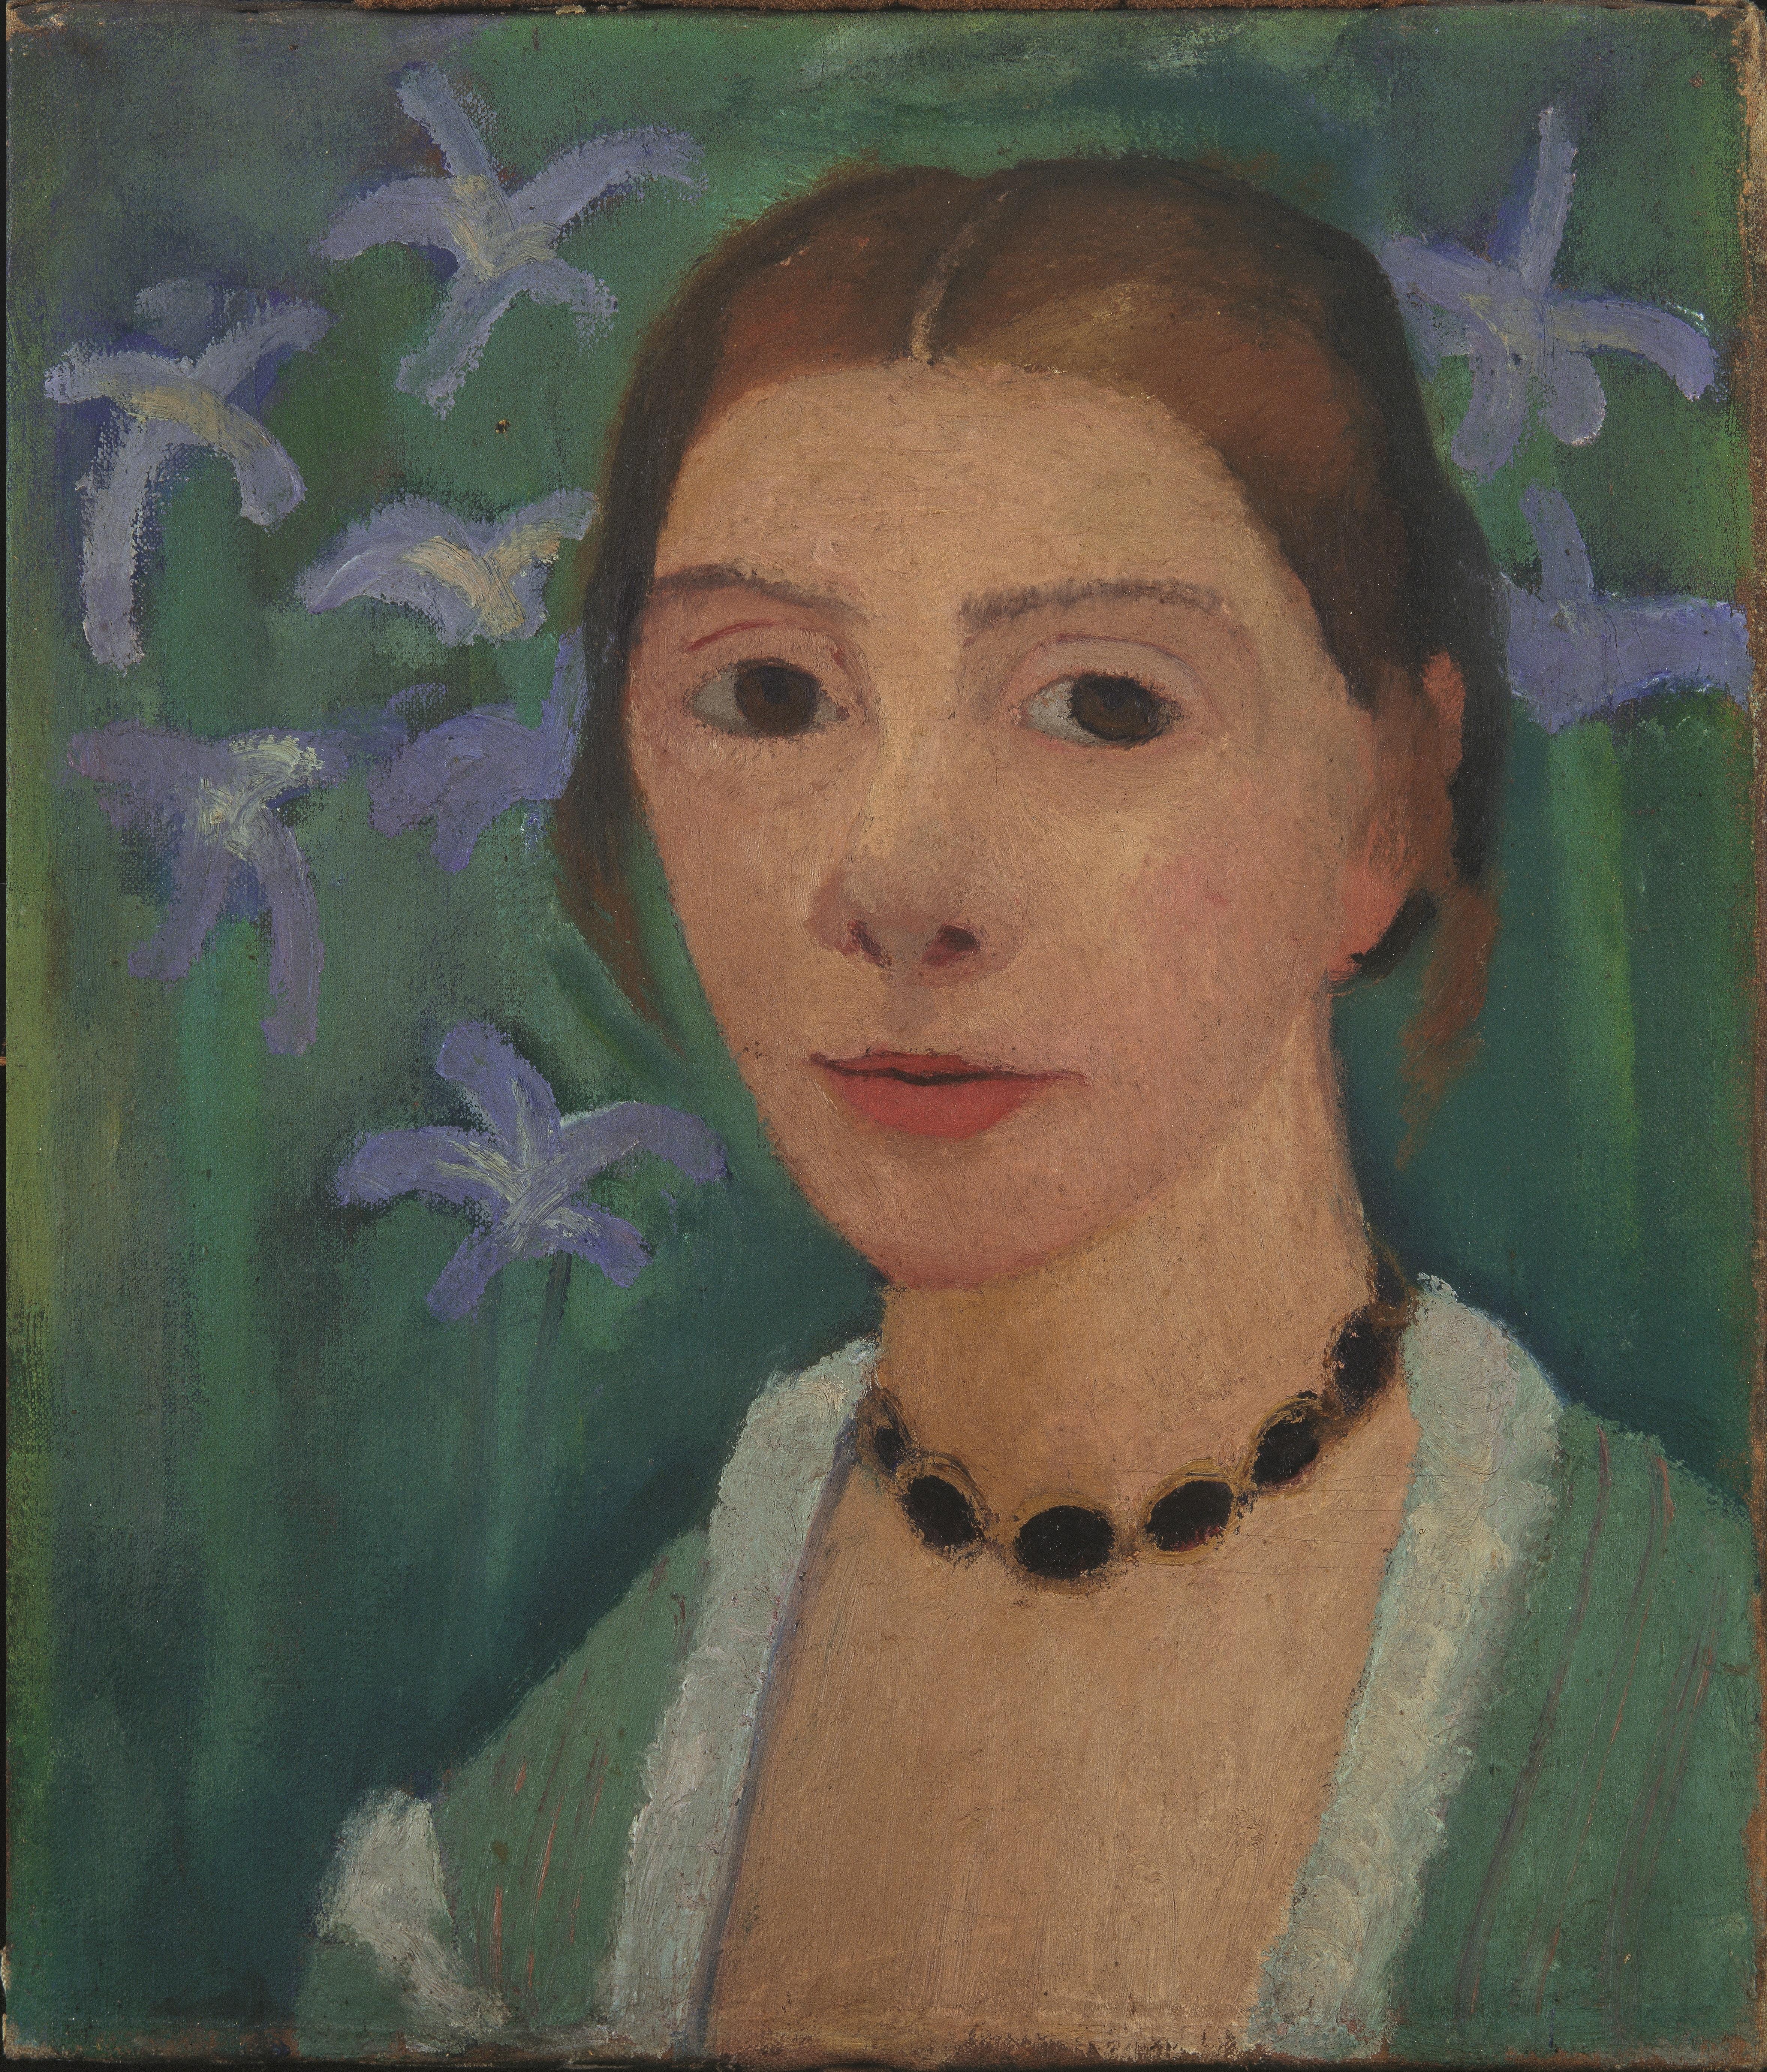 6.Paula Modersohn-Becker (1876-1907)